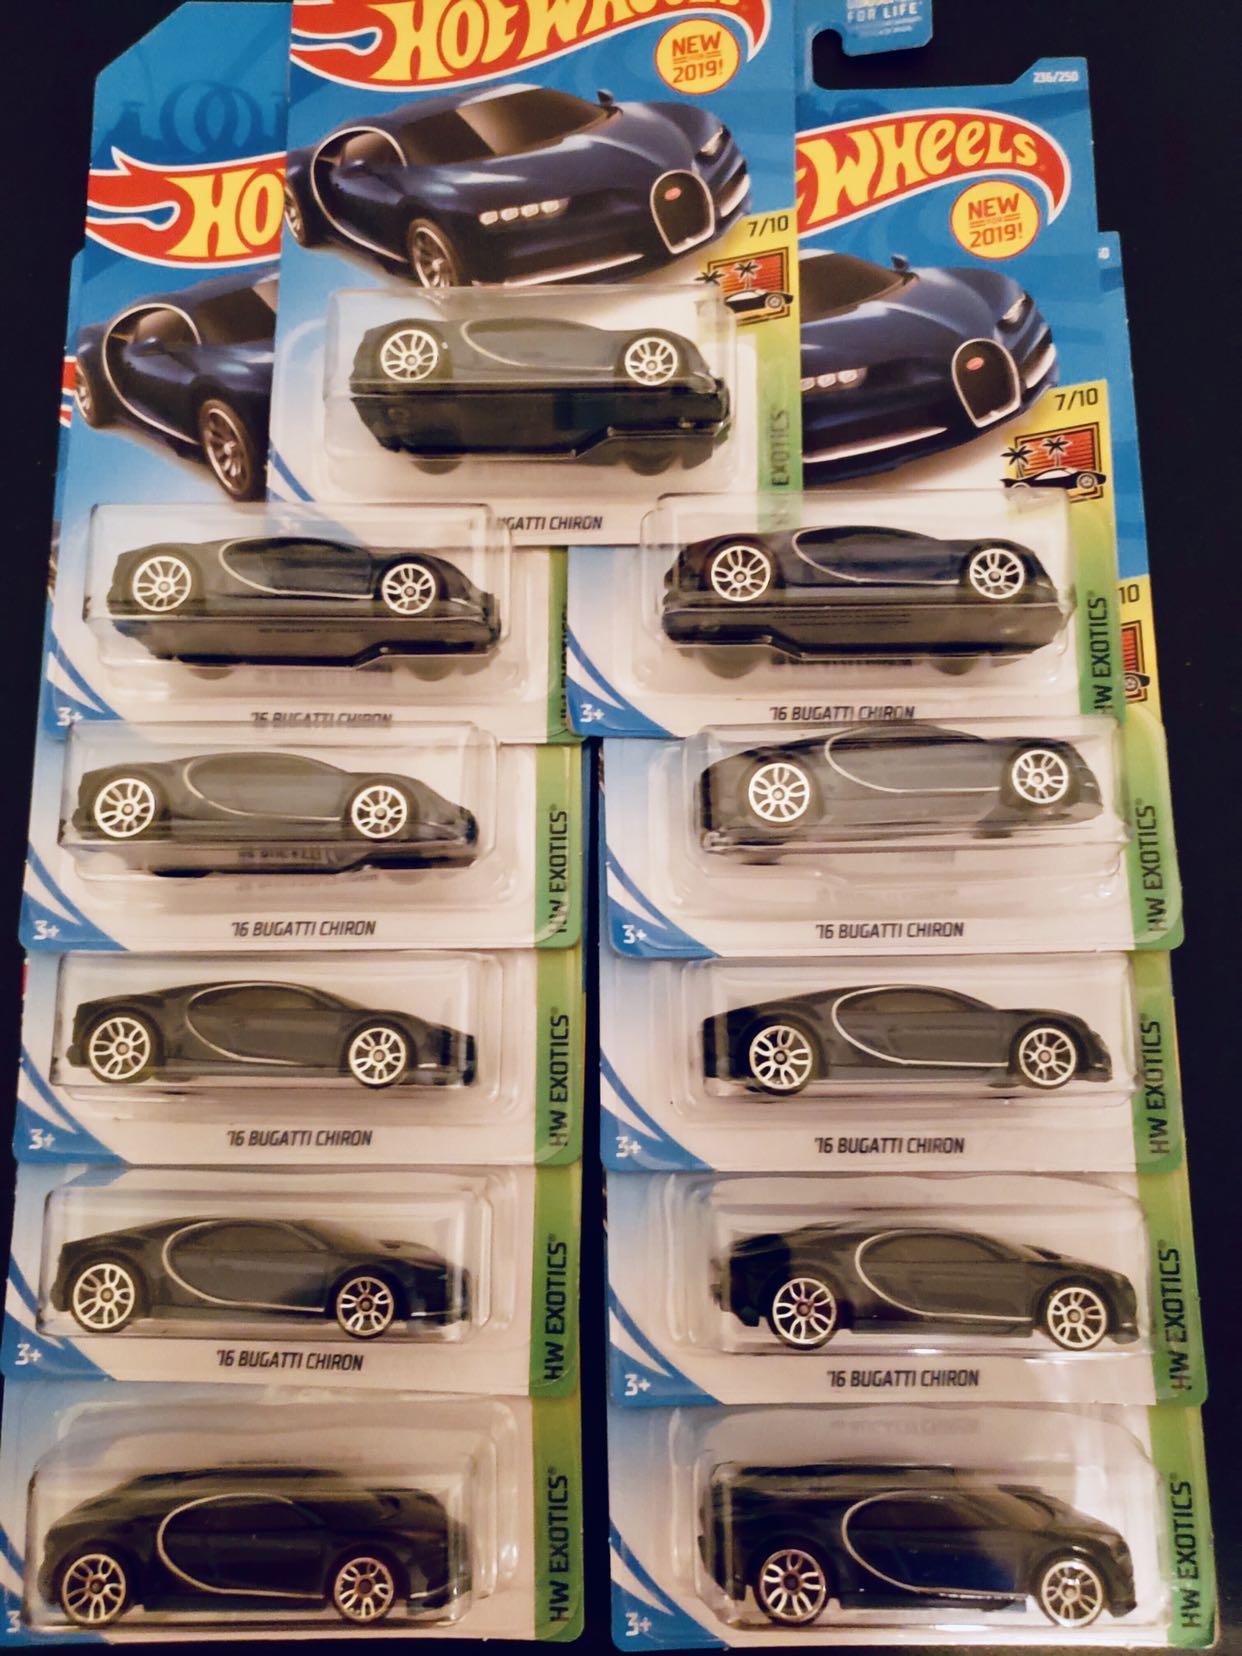 Hot Wheels 2019 Bugatti Chiron Toys Games Bricks Figurines On Carousell